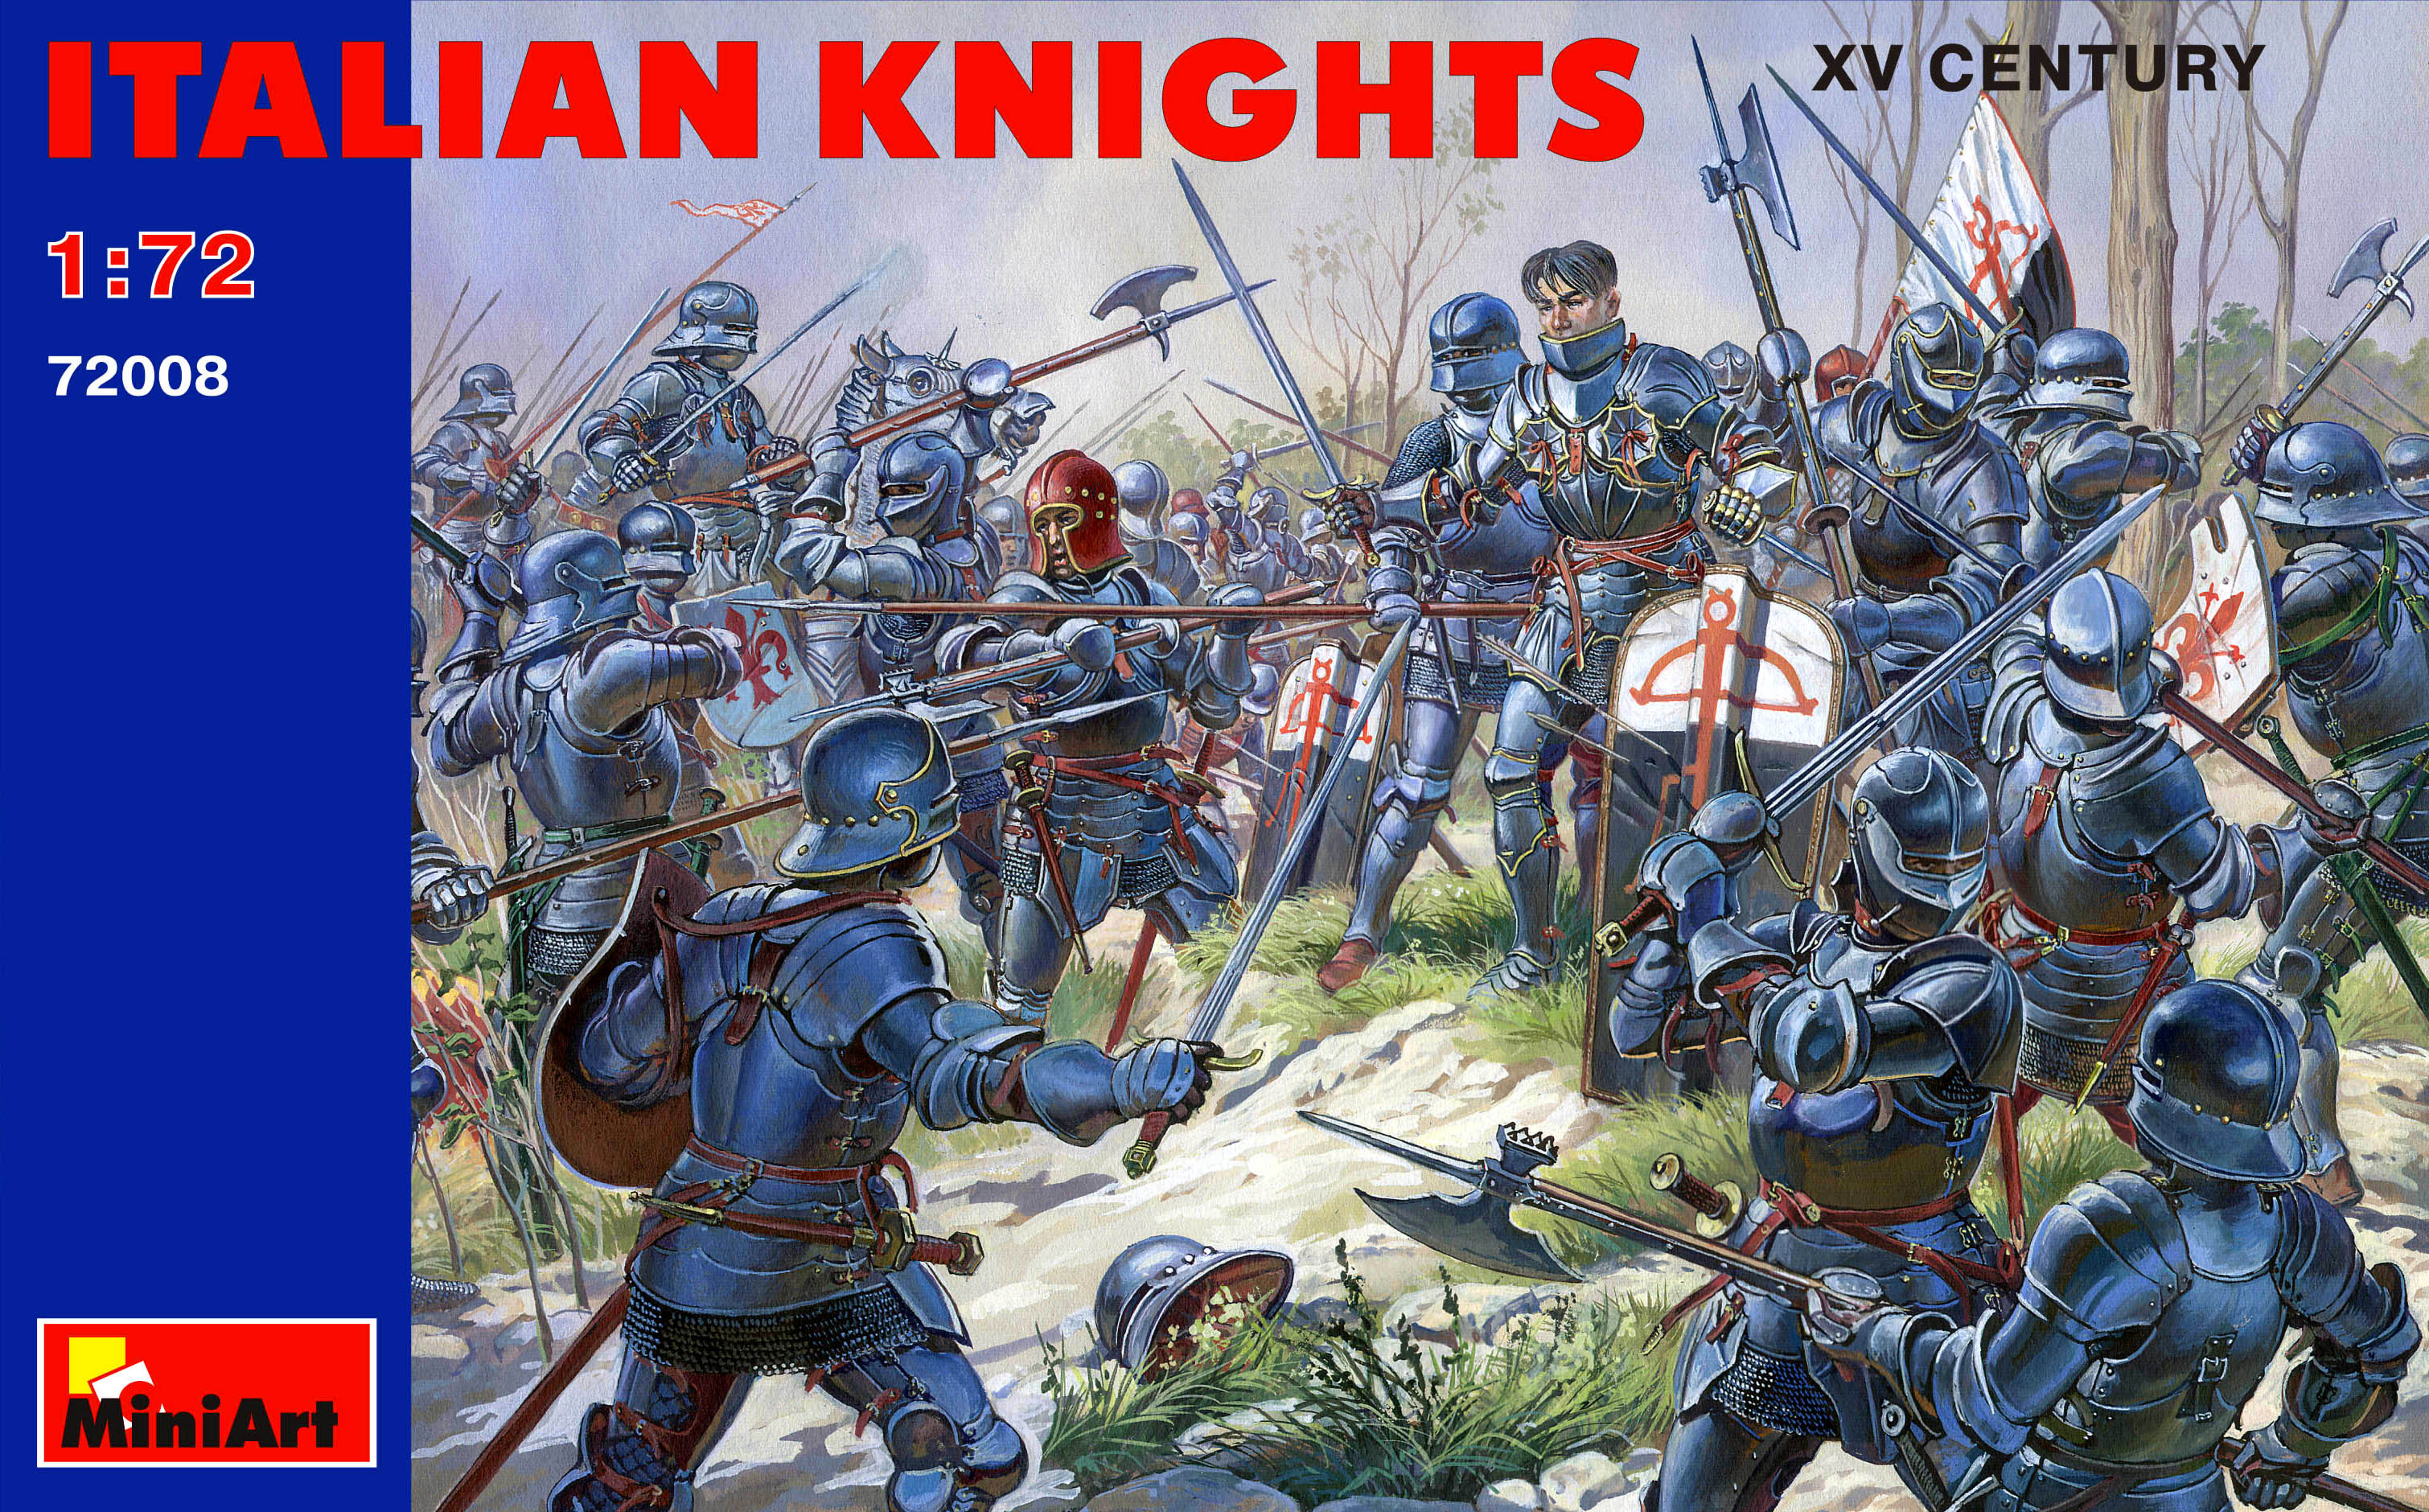 72008 ITALIAN KNIGHTS XV CENTURY